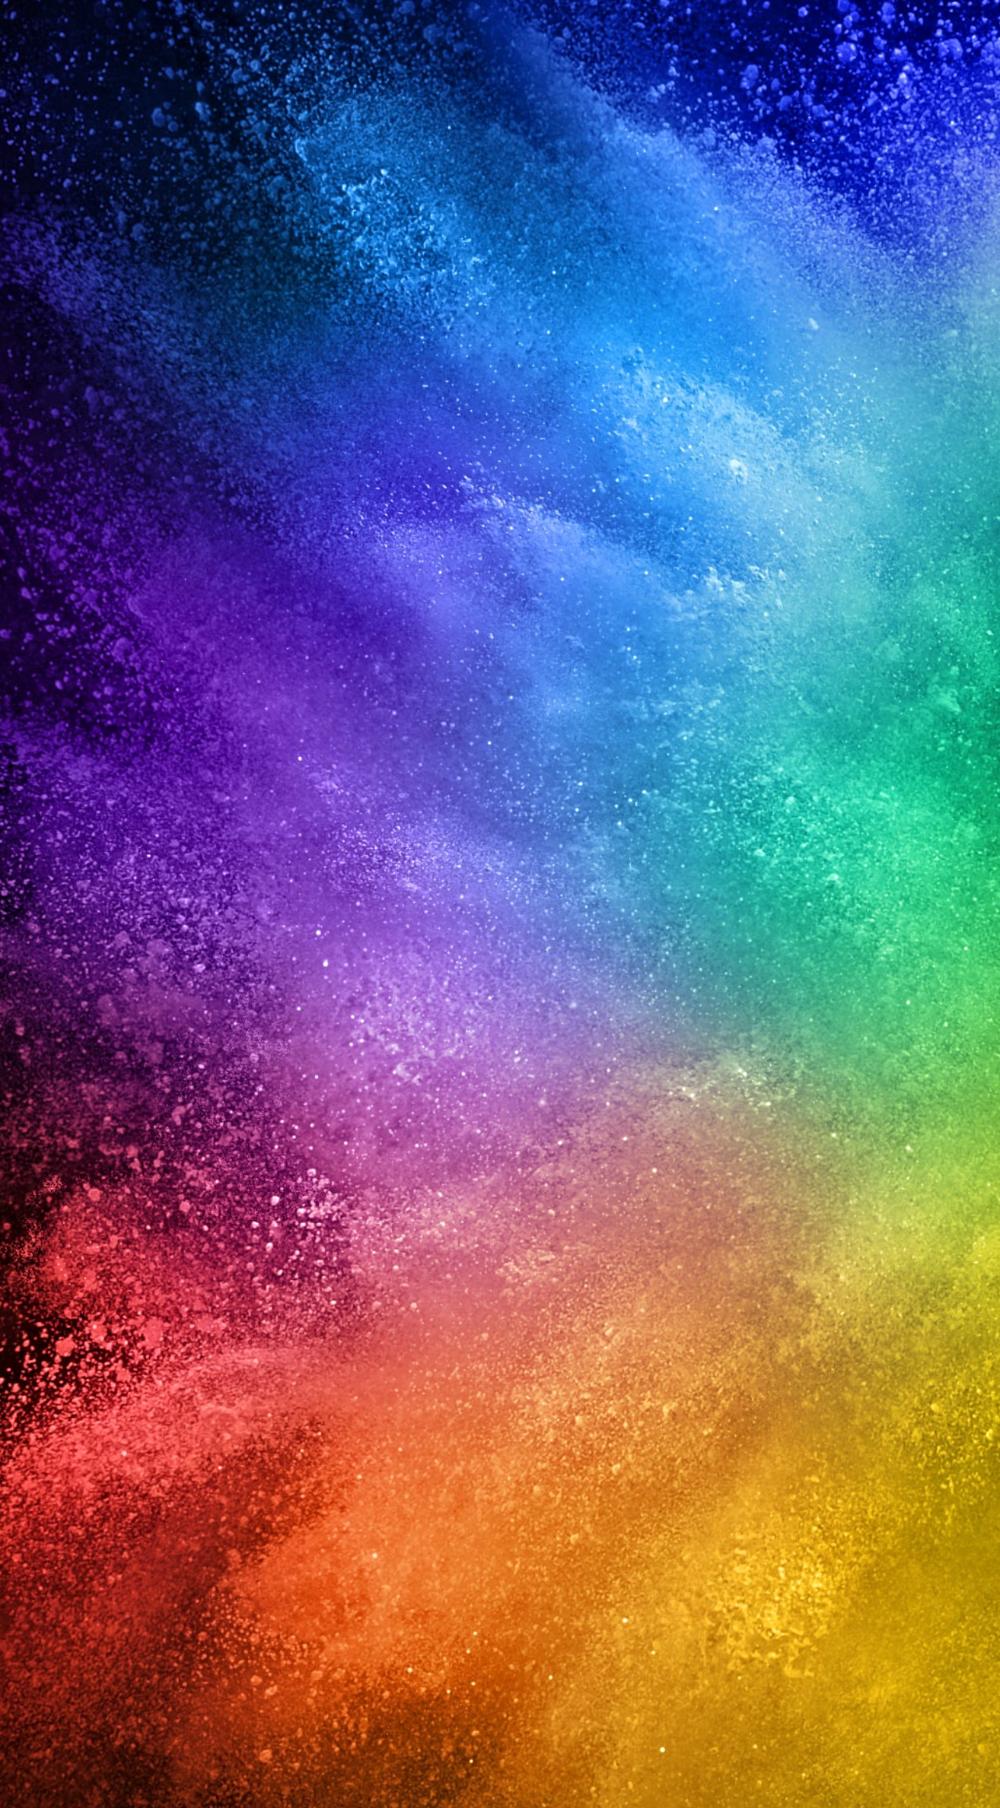 Colourful wallpaper